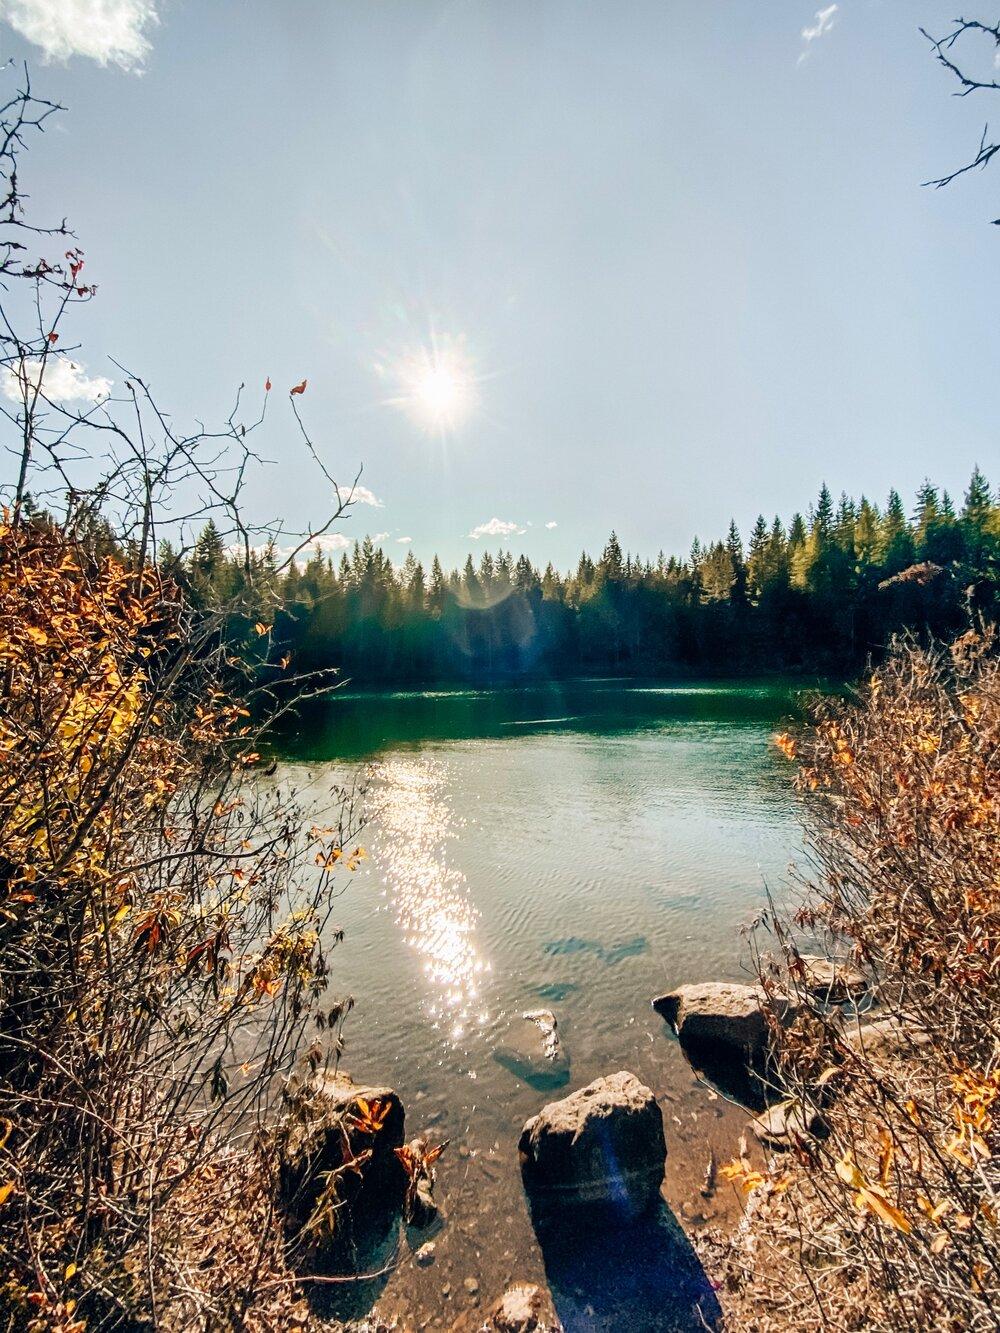 Fawn Lake at Alice Lake Provincial Park near Whistler BC